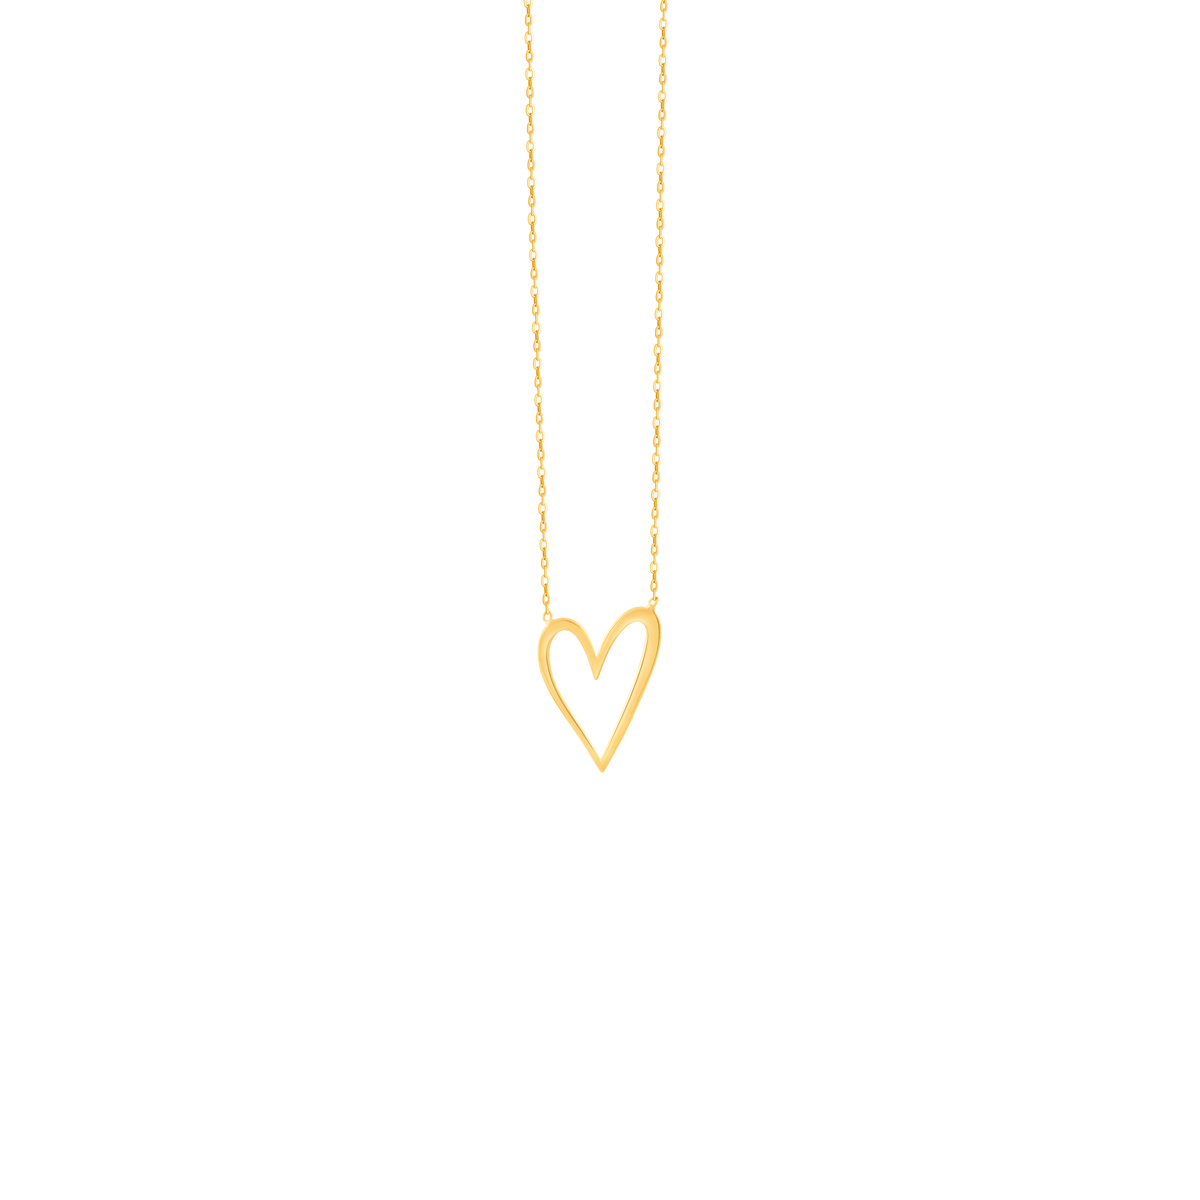 گردنبند طلا قلب توخالی